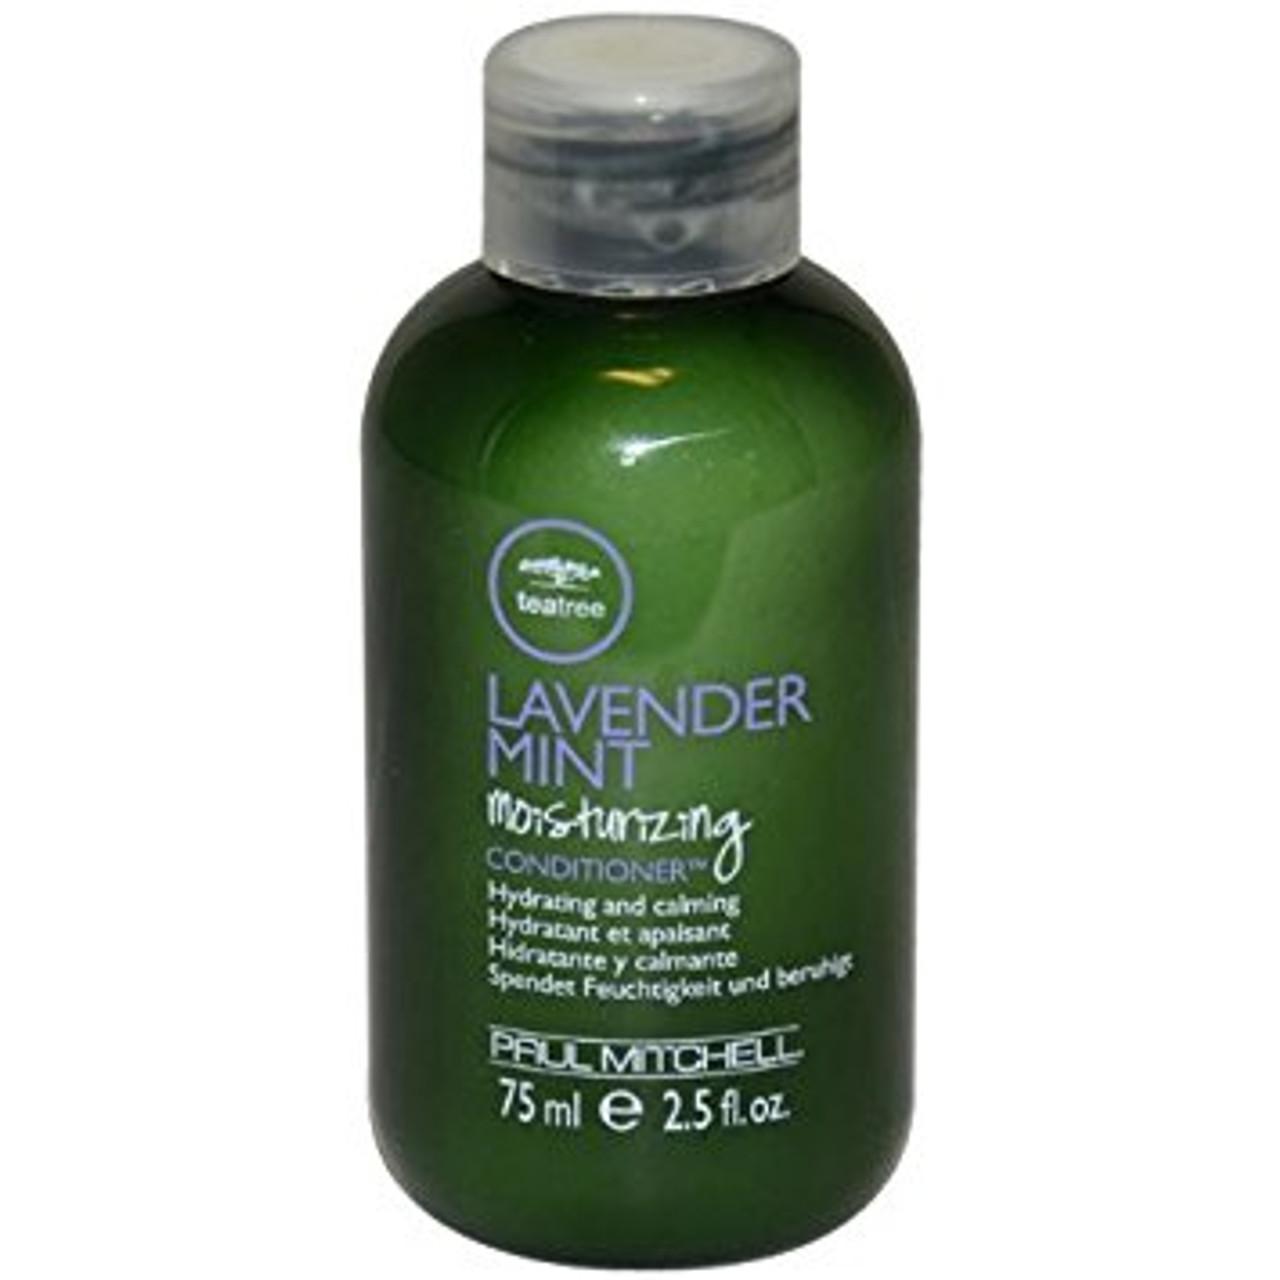 Paul Mitchell Lavender Mint Conditioner 2.5 oz